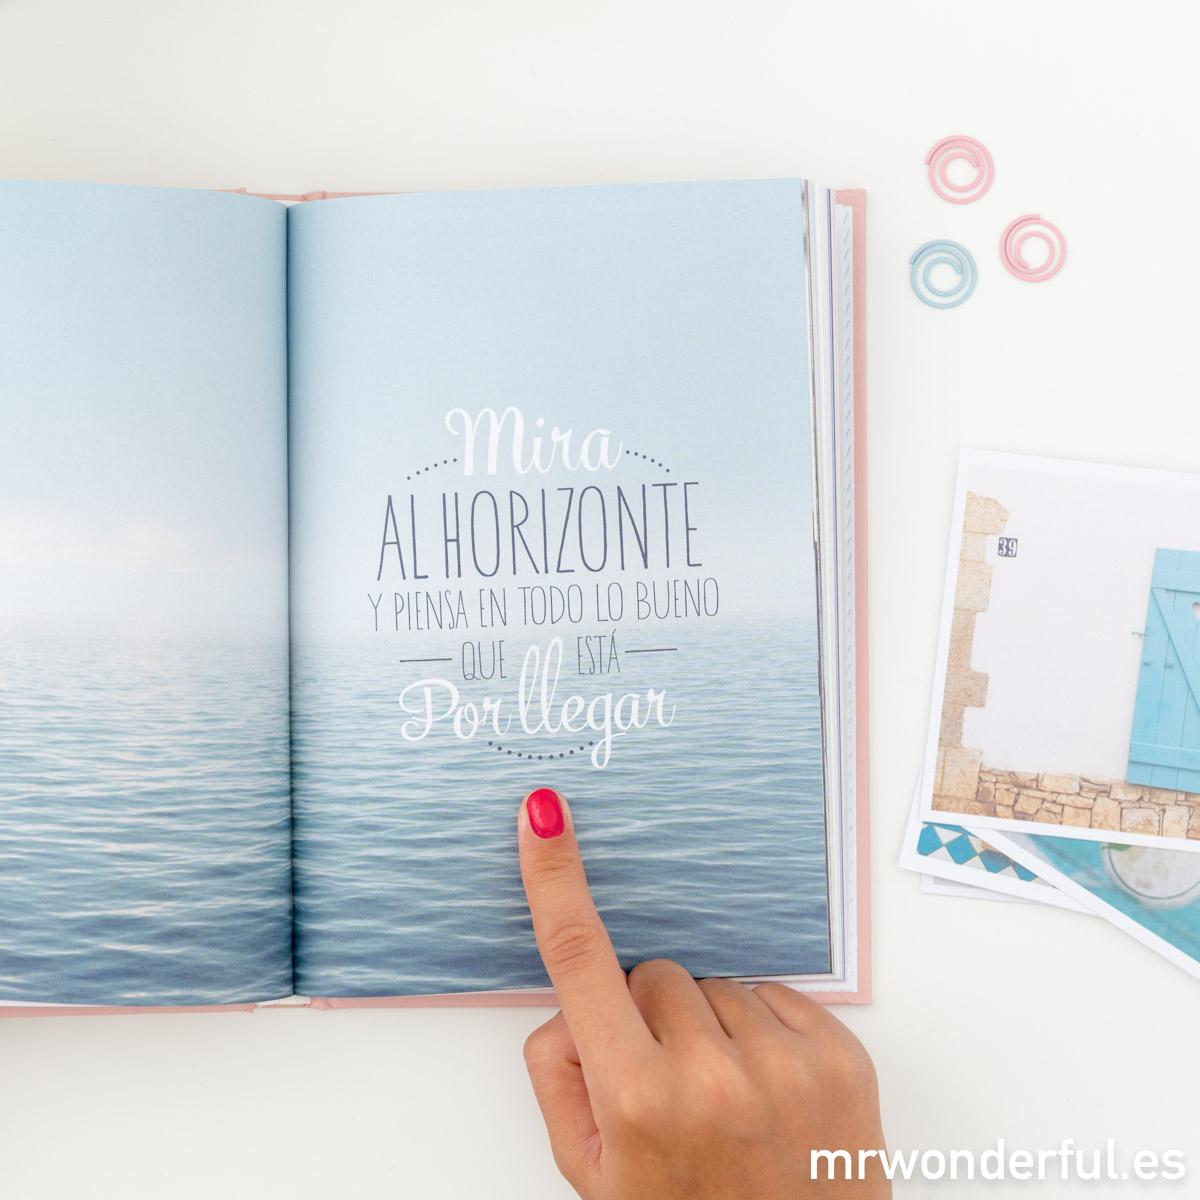 mrwonderful_9788416489725_libro-cosas-reedicion-2016-7-Editar